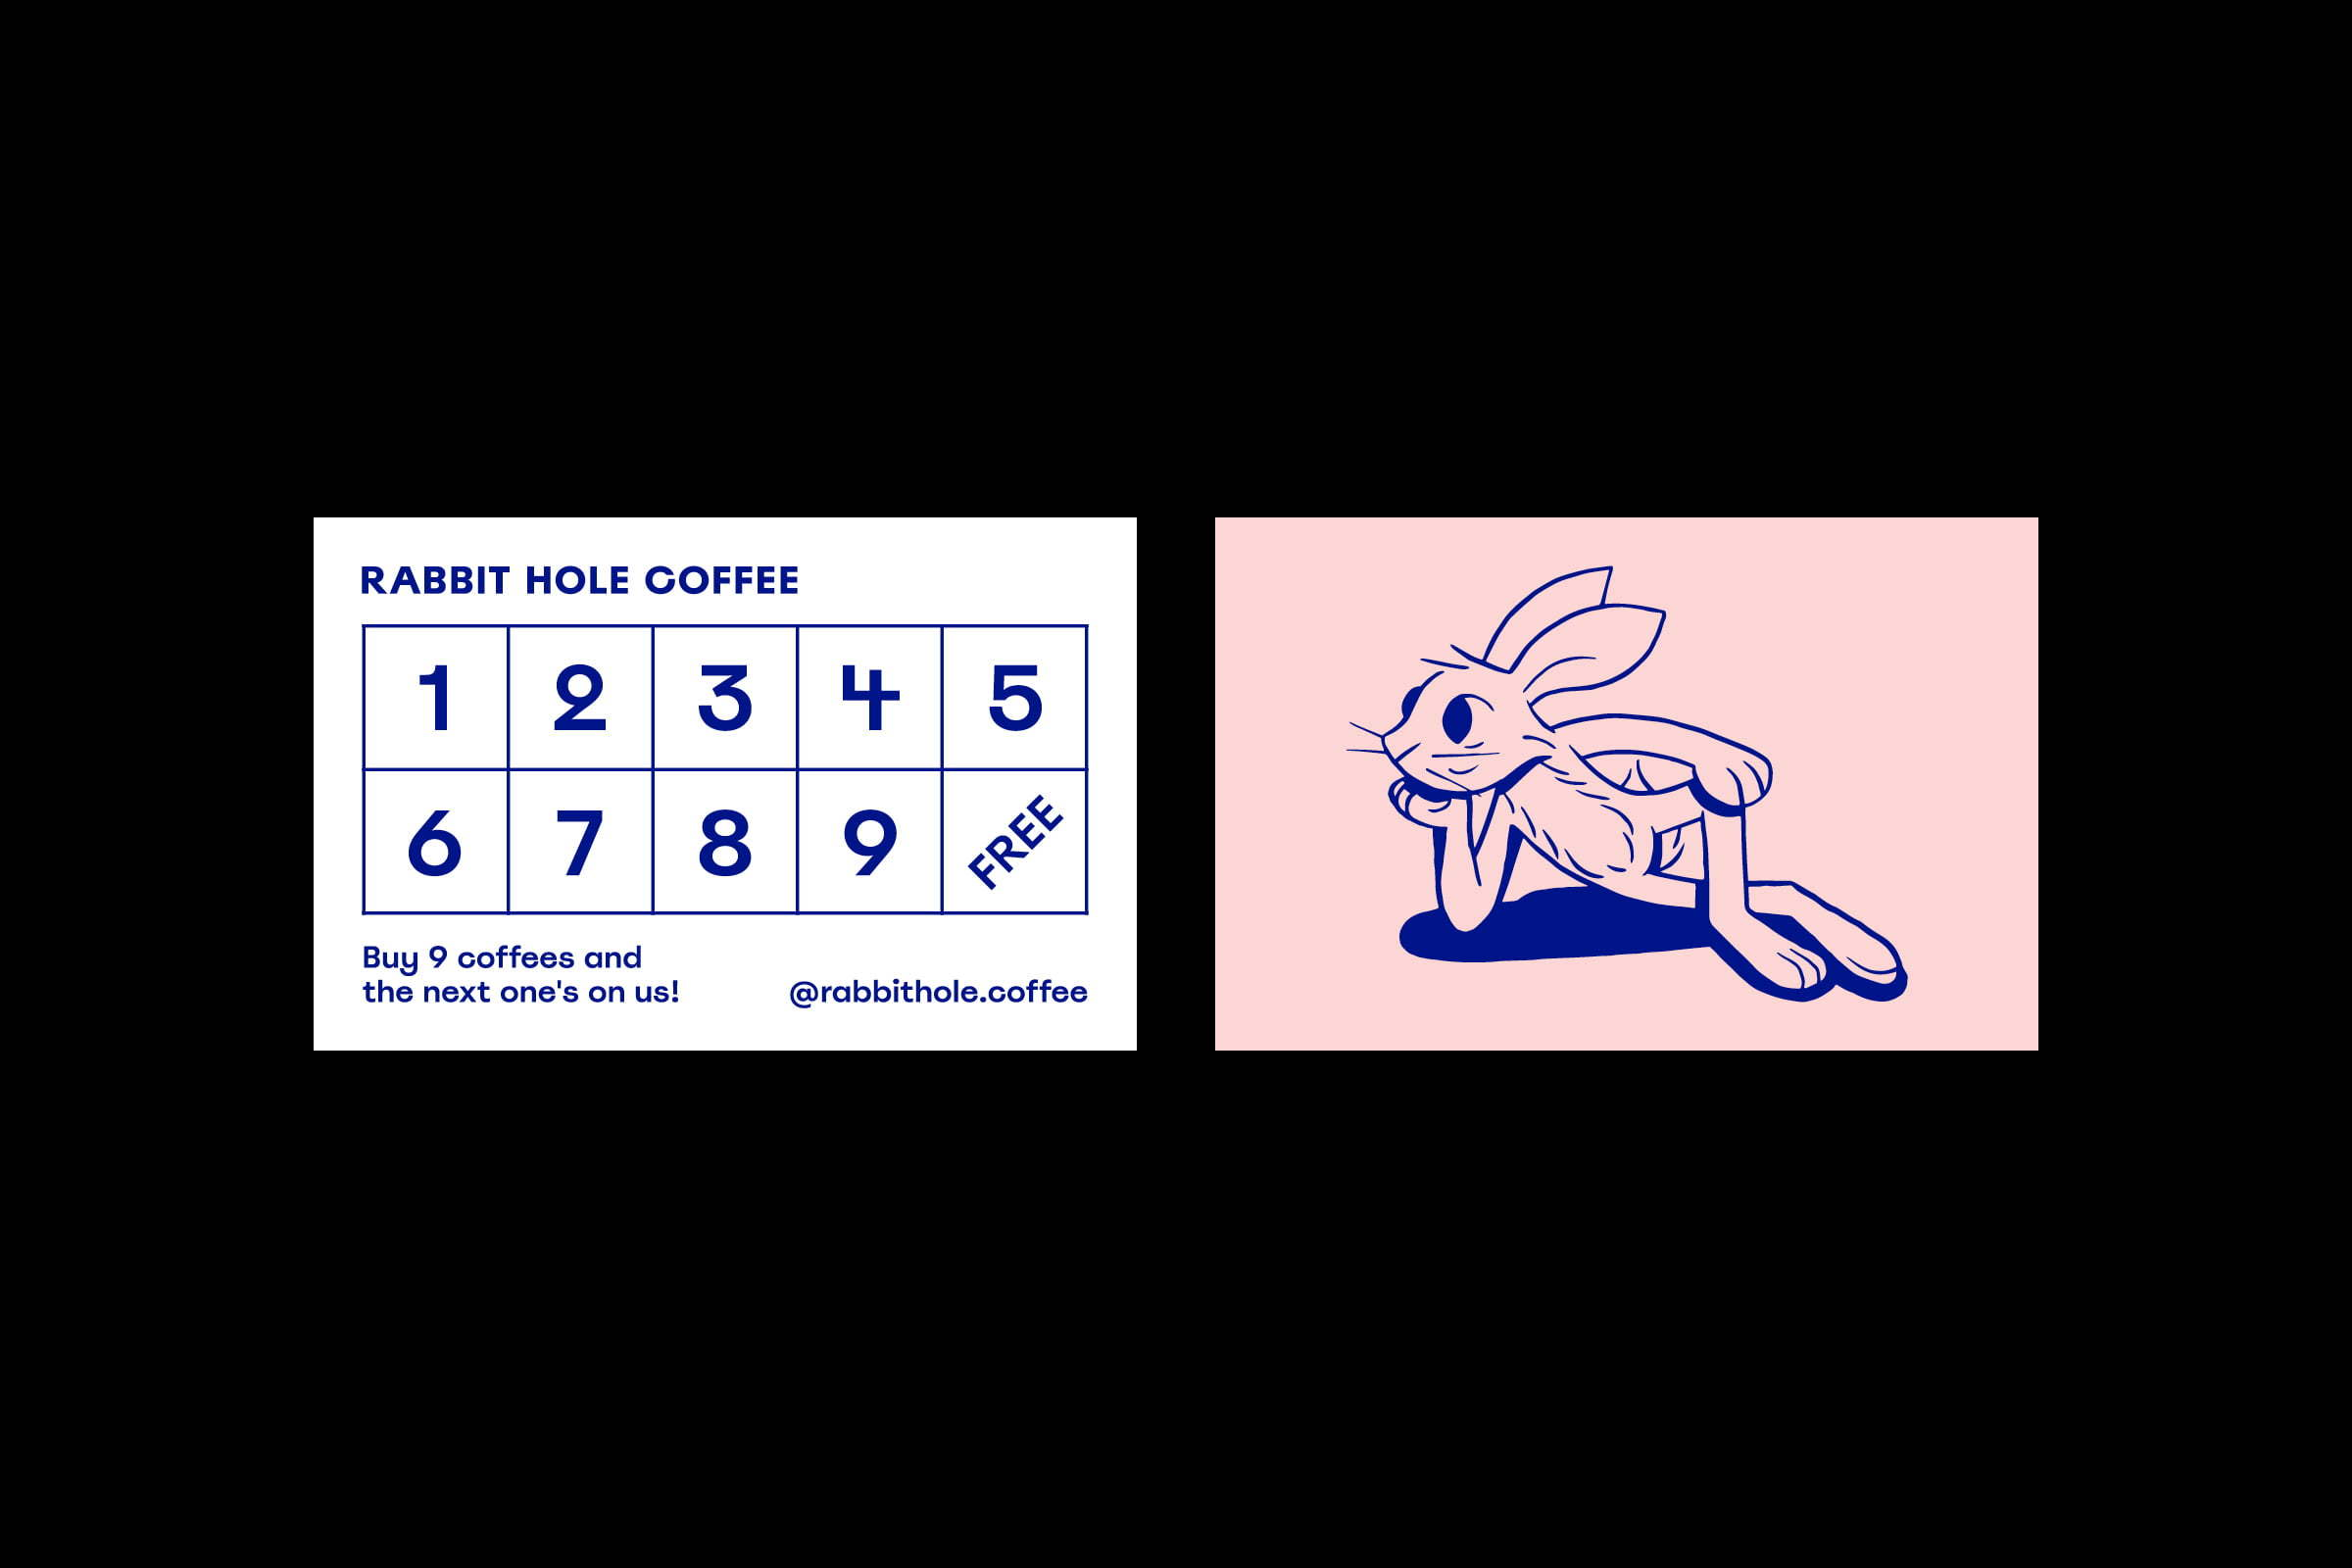 saul studio — Rabbit Hole Coffee